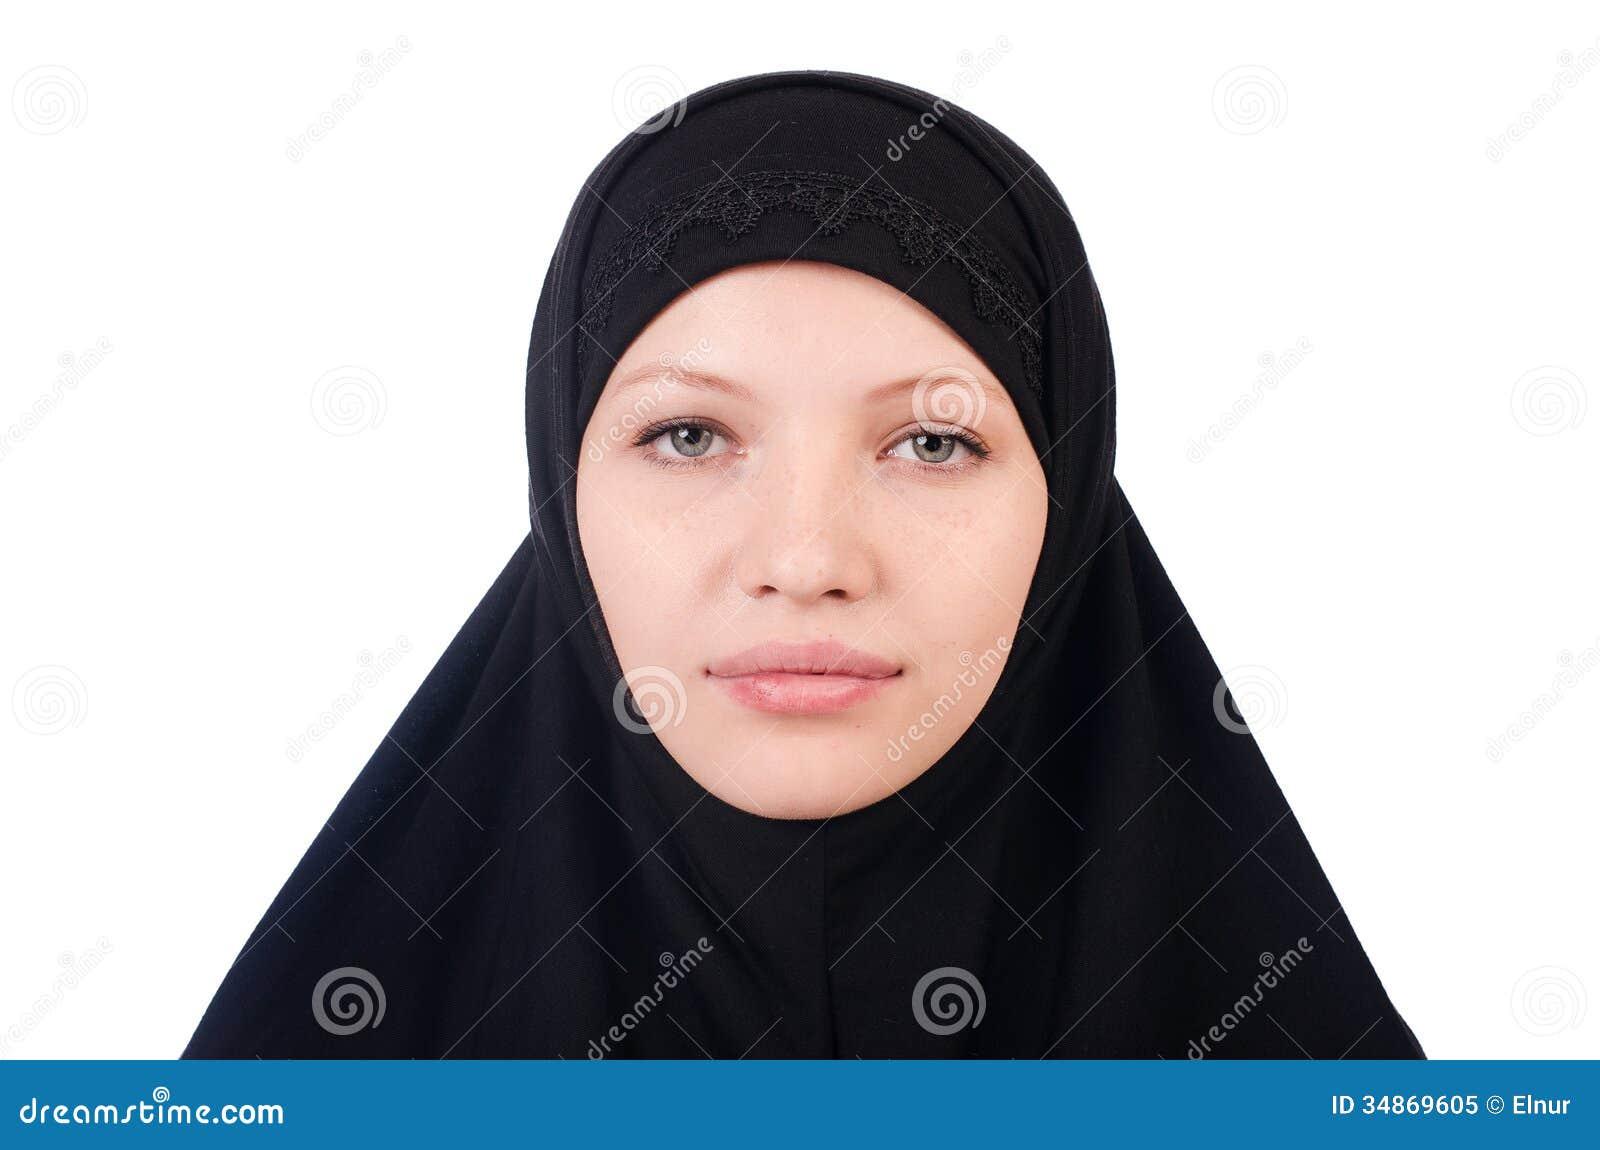 Muslim dating white girl